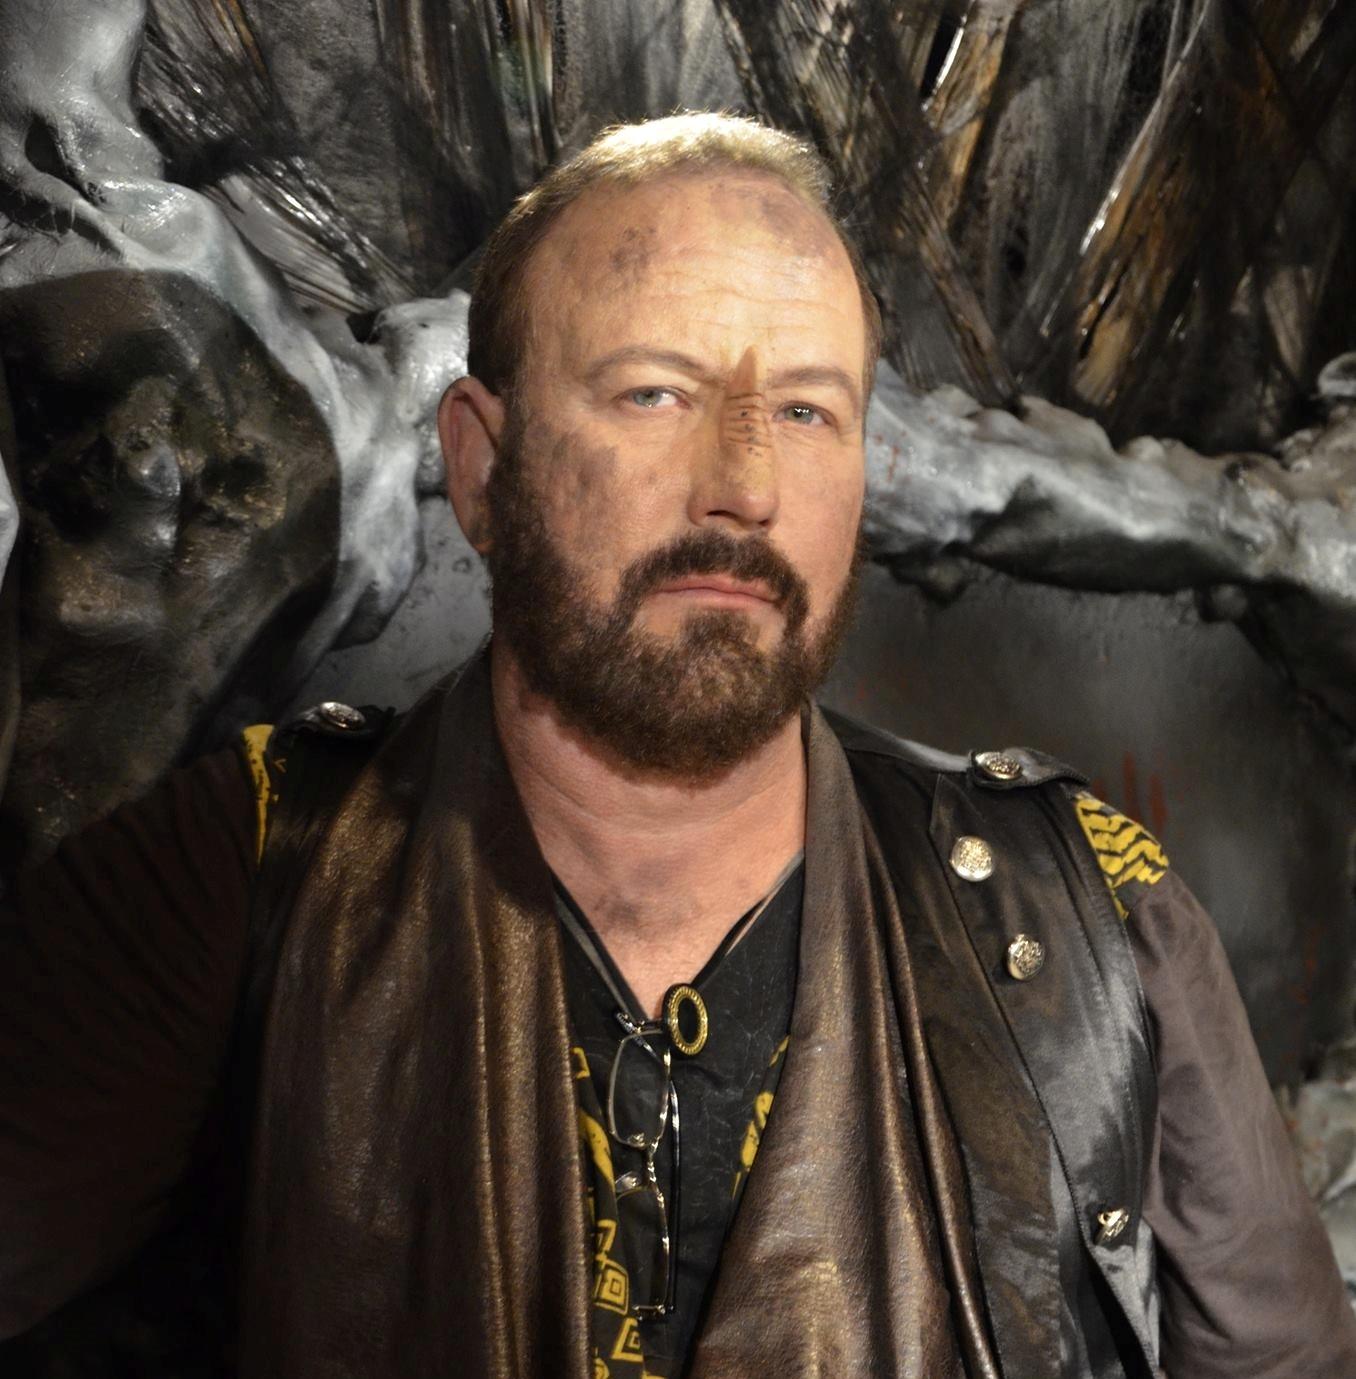 Kevin Fry-Bowers as Jaro, Star Trek Renegades - Makeup by ImpaQt FX